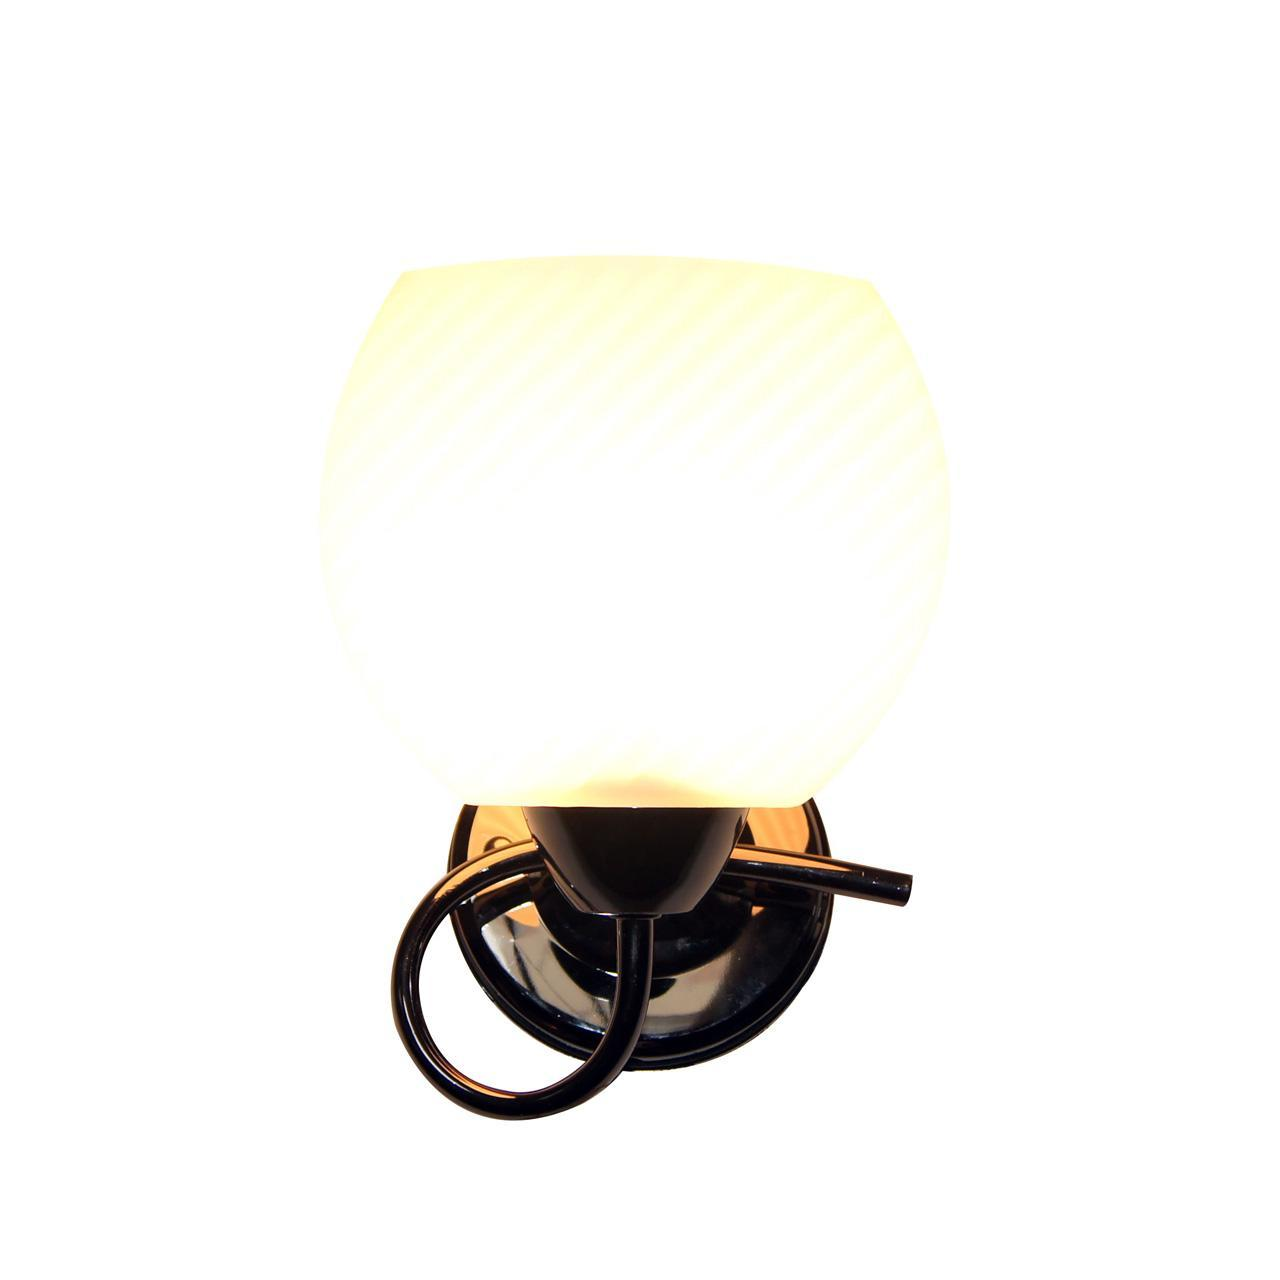 Бра IDLamp Elda 853/1A-Blackchrome 2 подсвечника из ртутного стекла elda